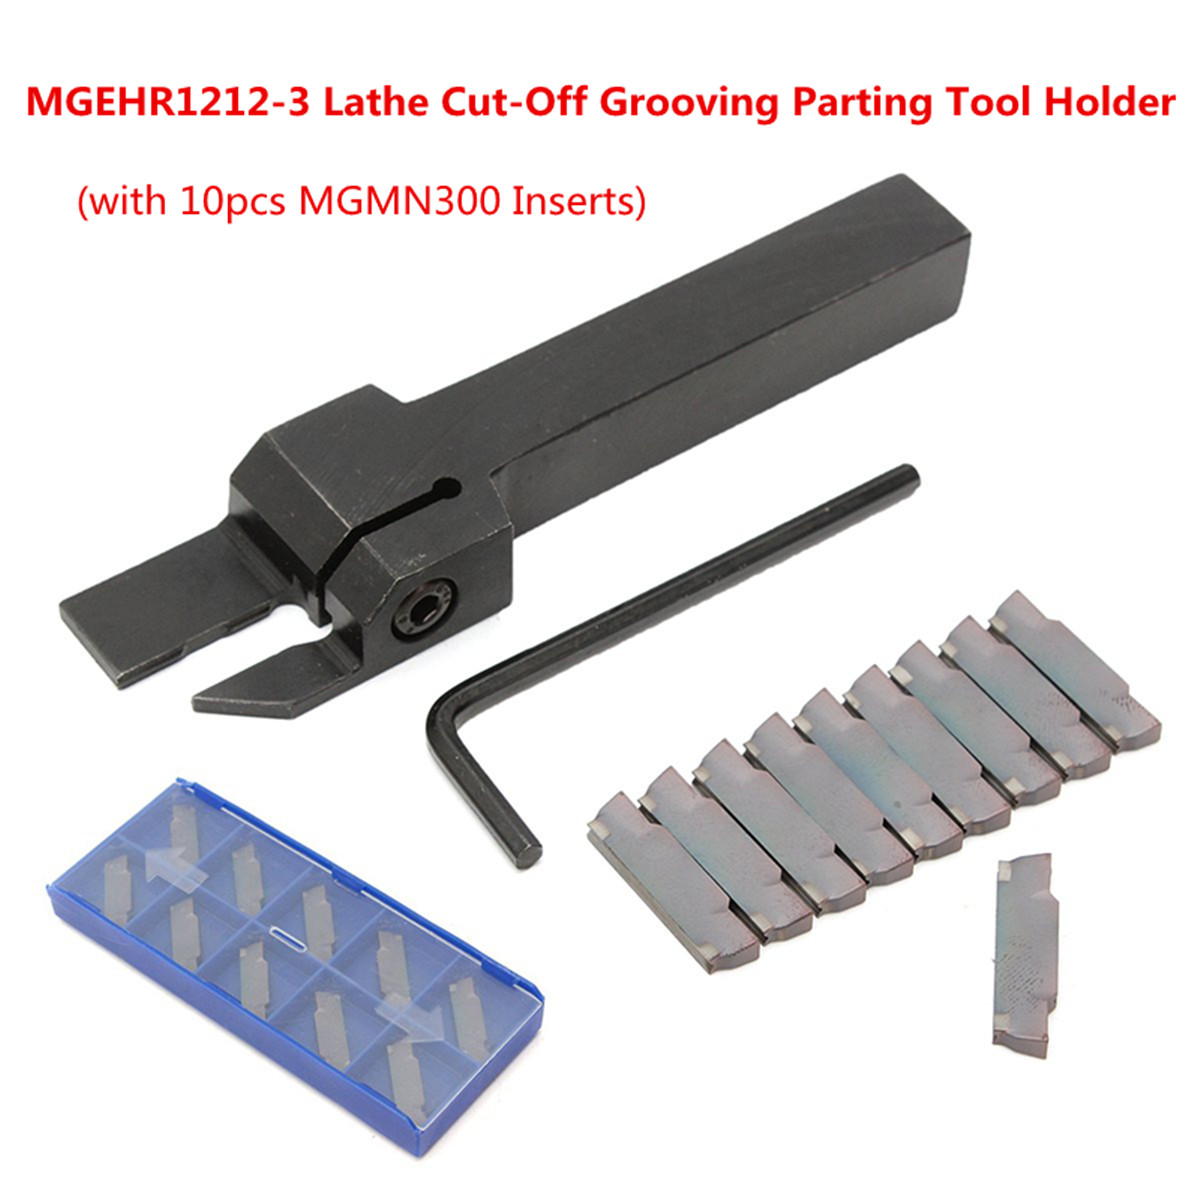 Tanice SPB26-3 26mm Parting Grooving Cut-Off Tool with 10pcs GTN-3 SP300 Insert for Steel Semi-finishing